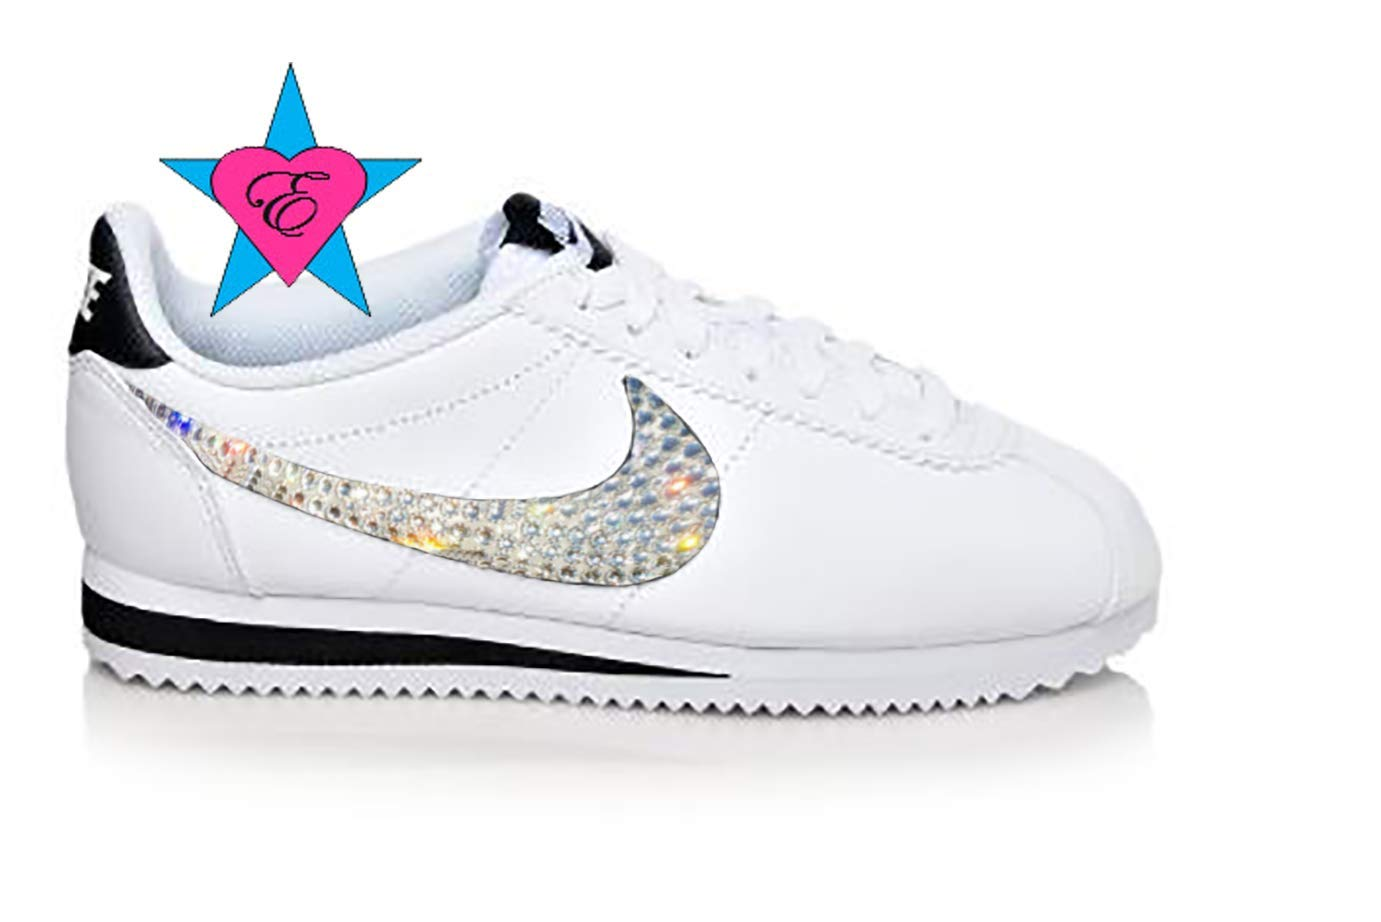 save off 0950a cf159 Amazon.com: Glitter Kicks Nike Kids | Bedazzled White Black ...